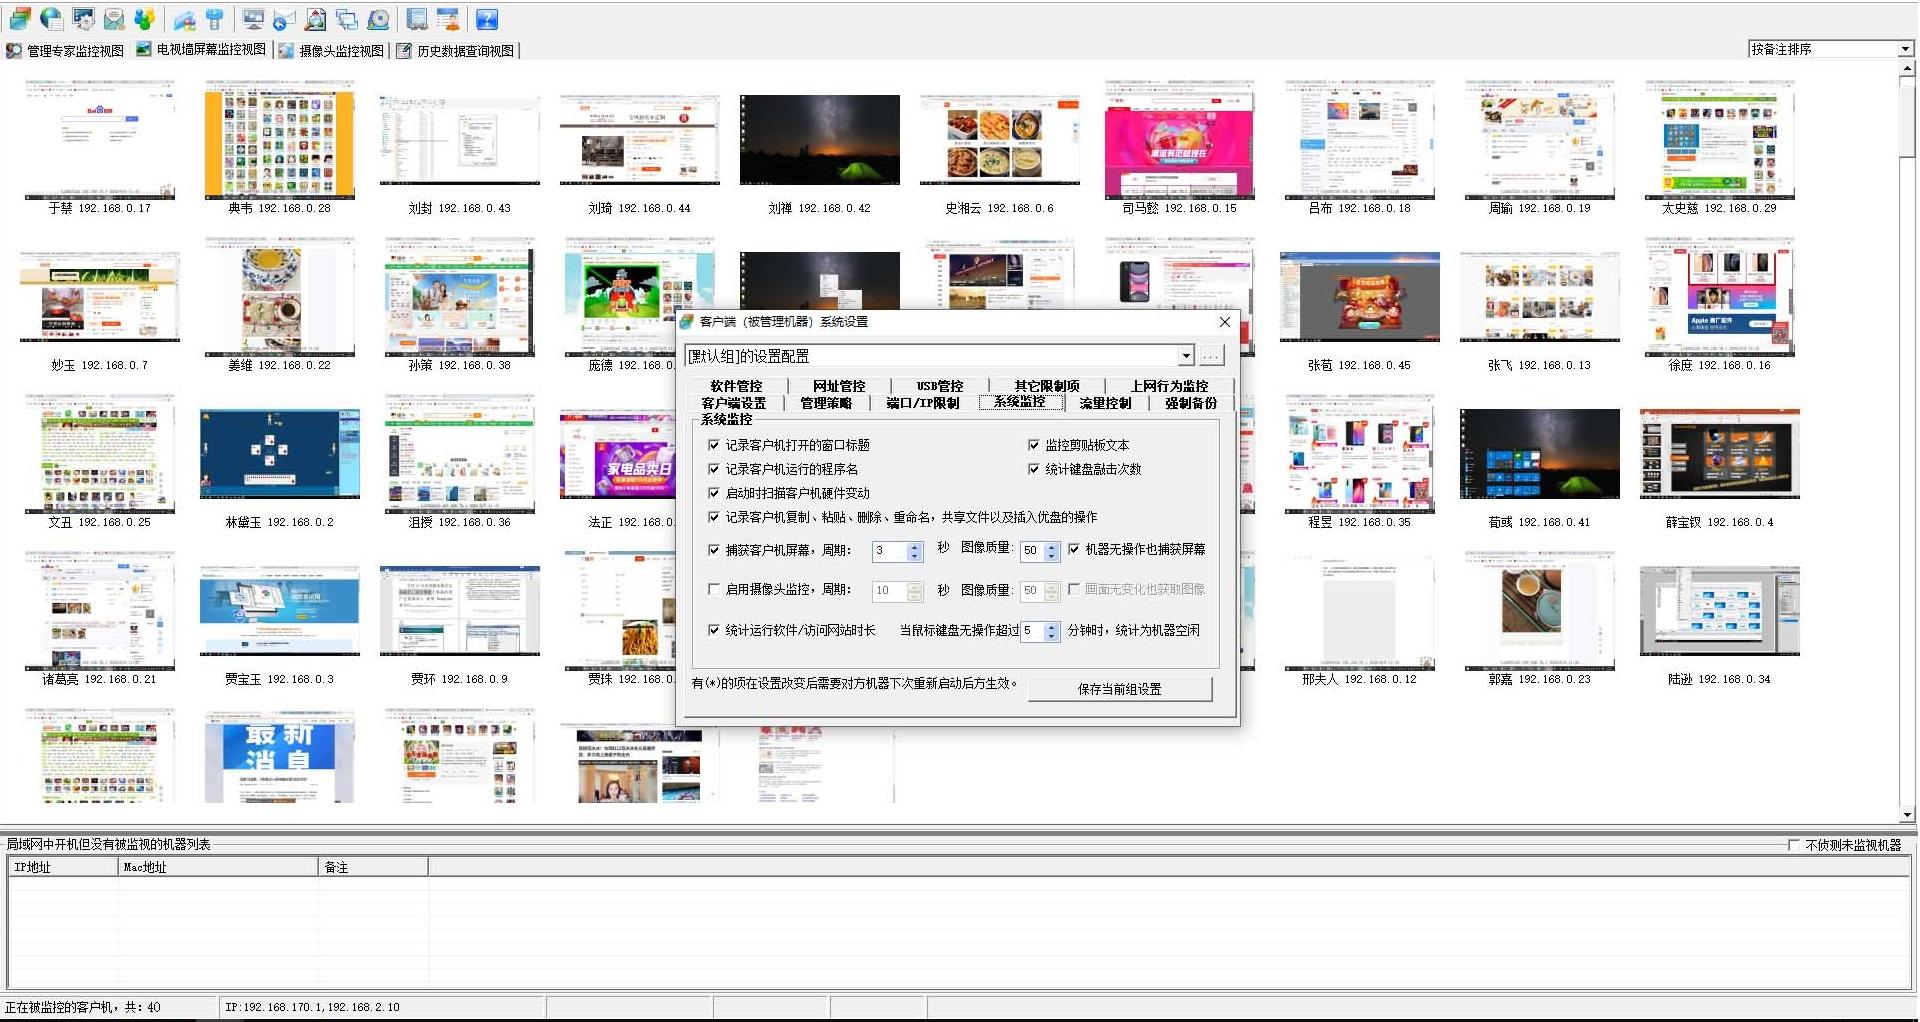 Admin900网管软件